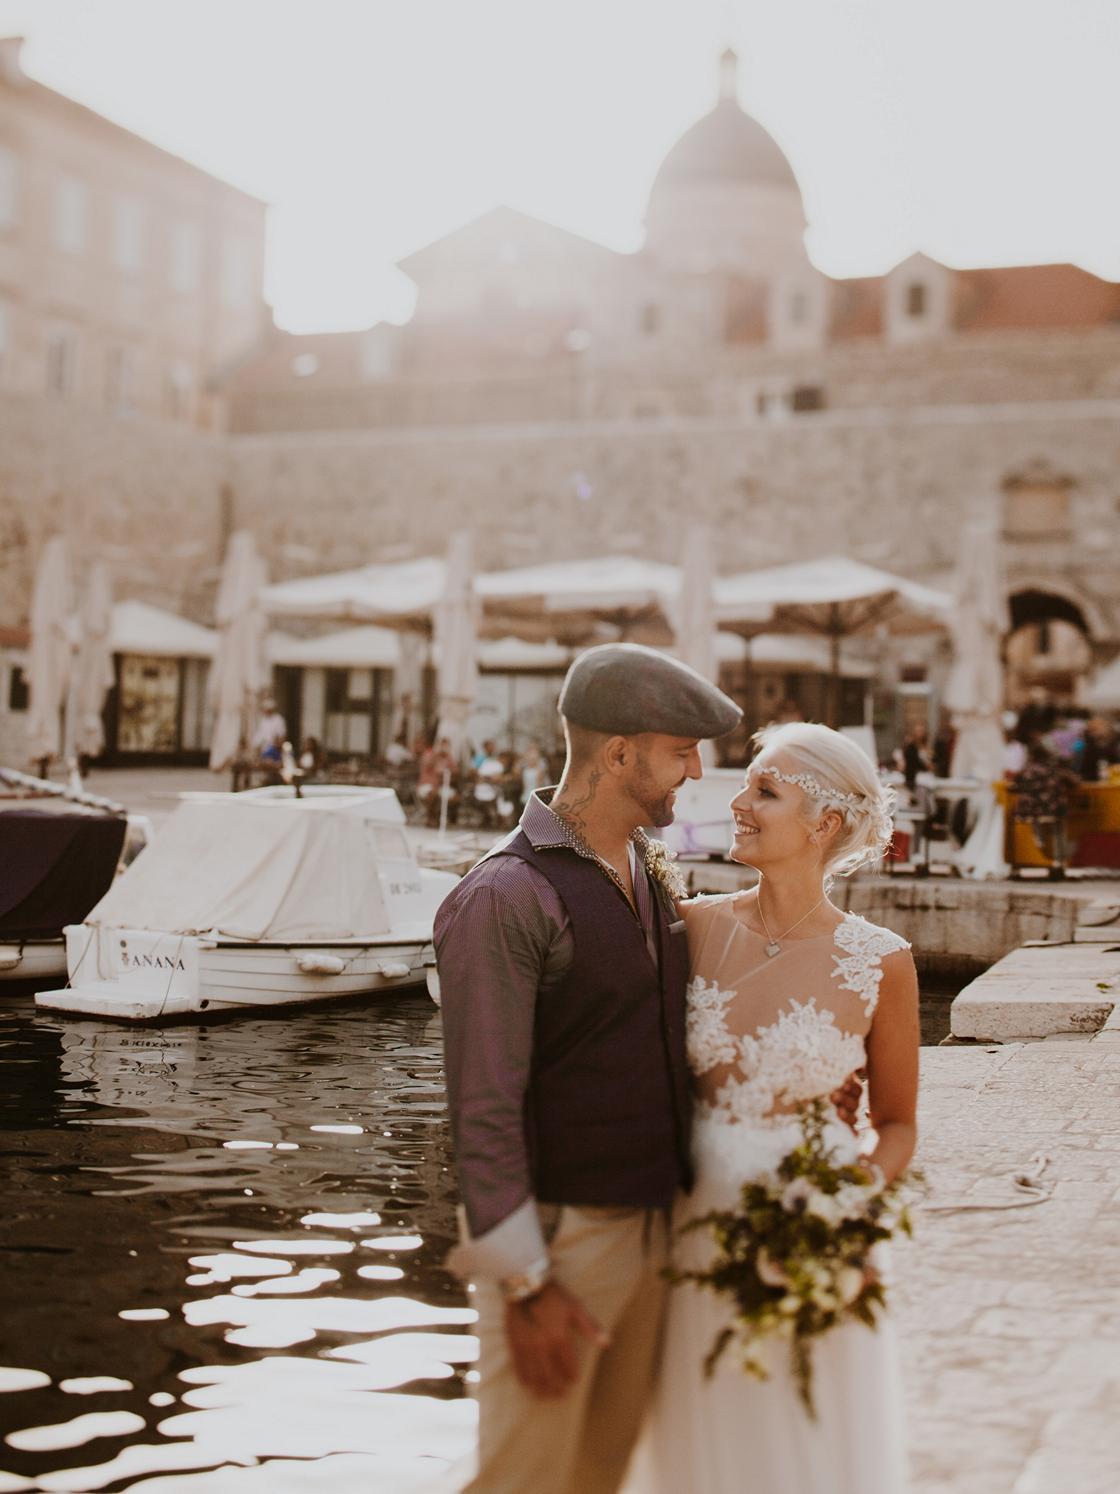 dubrovnik-wedding-photographer-croatia-destination-weddings-jenna-rich053